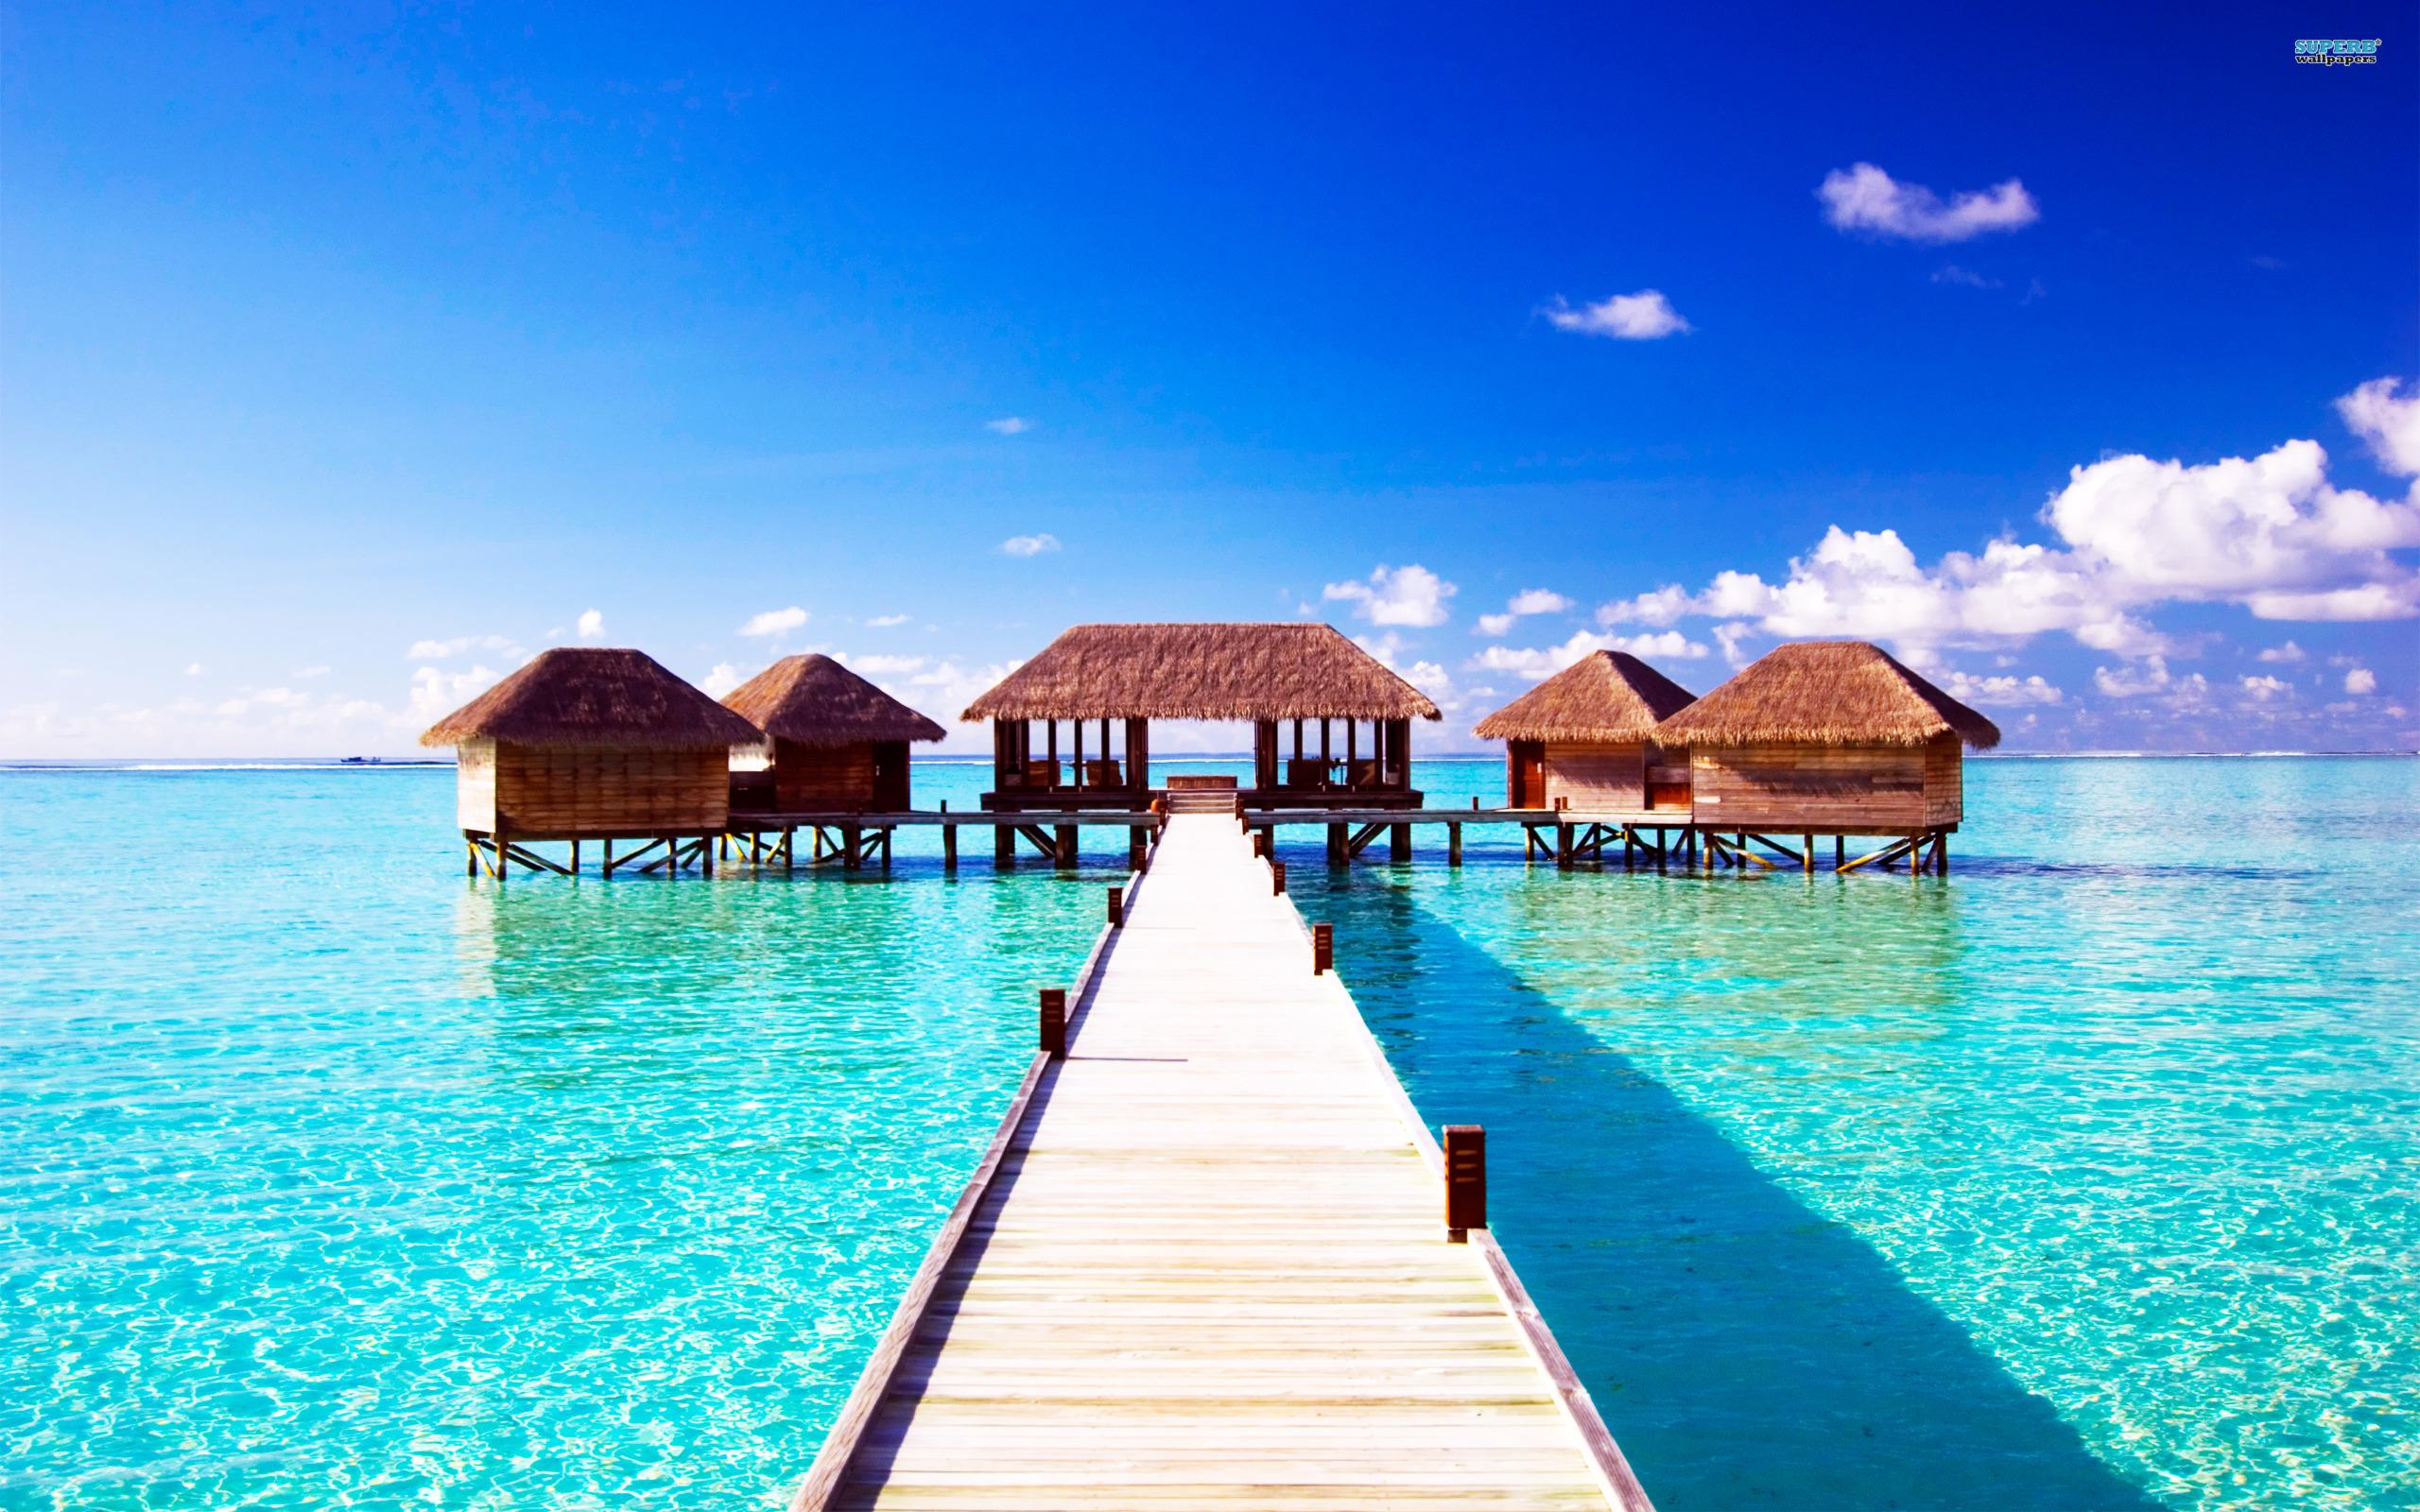 http://www.prasannaholidays.com/wp-content/uploads/2015/04/maldives-13115-2560x1600.jpg